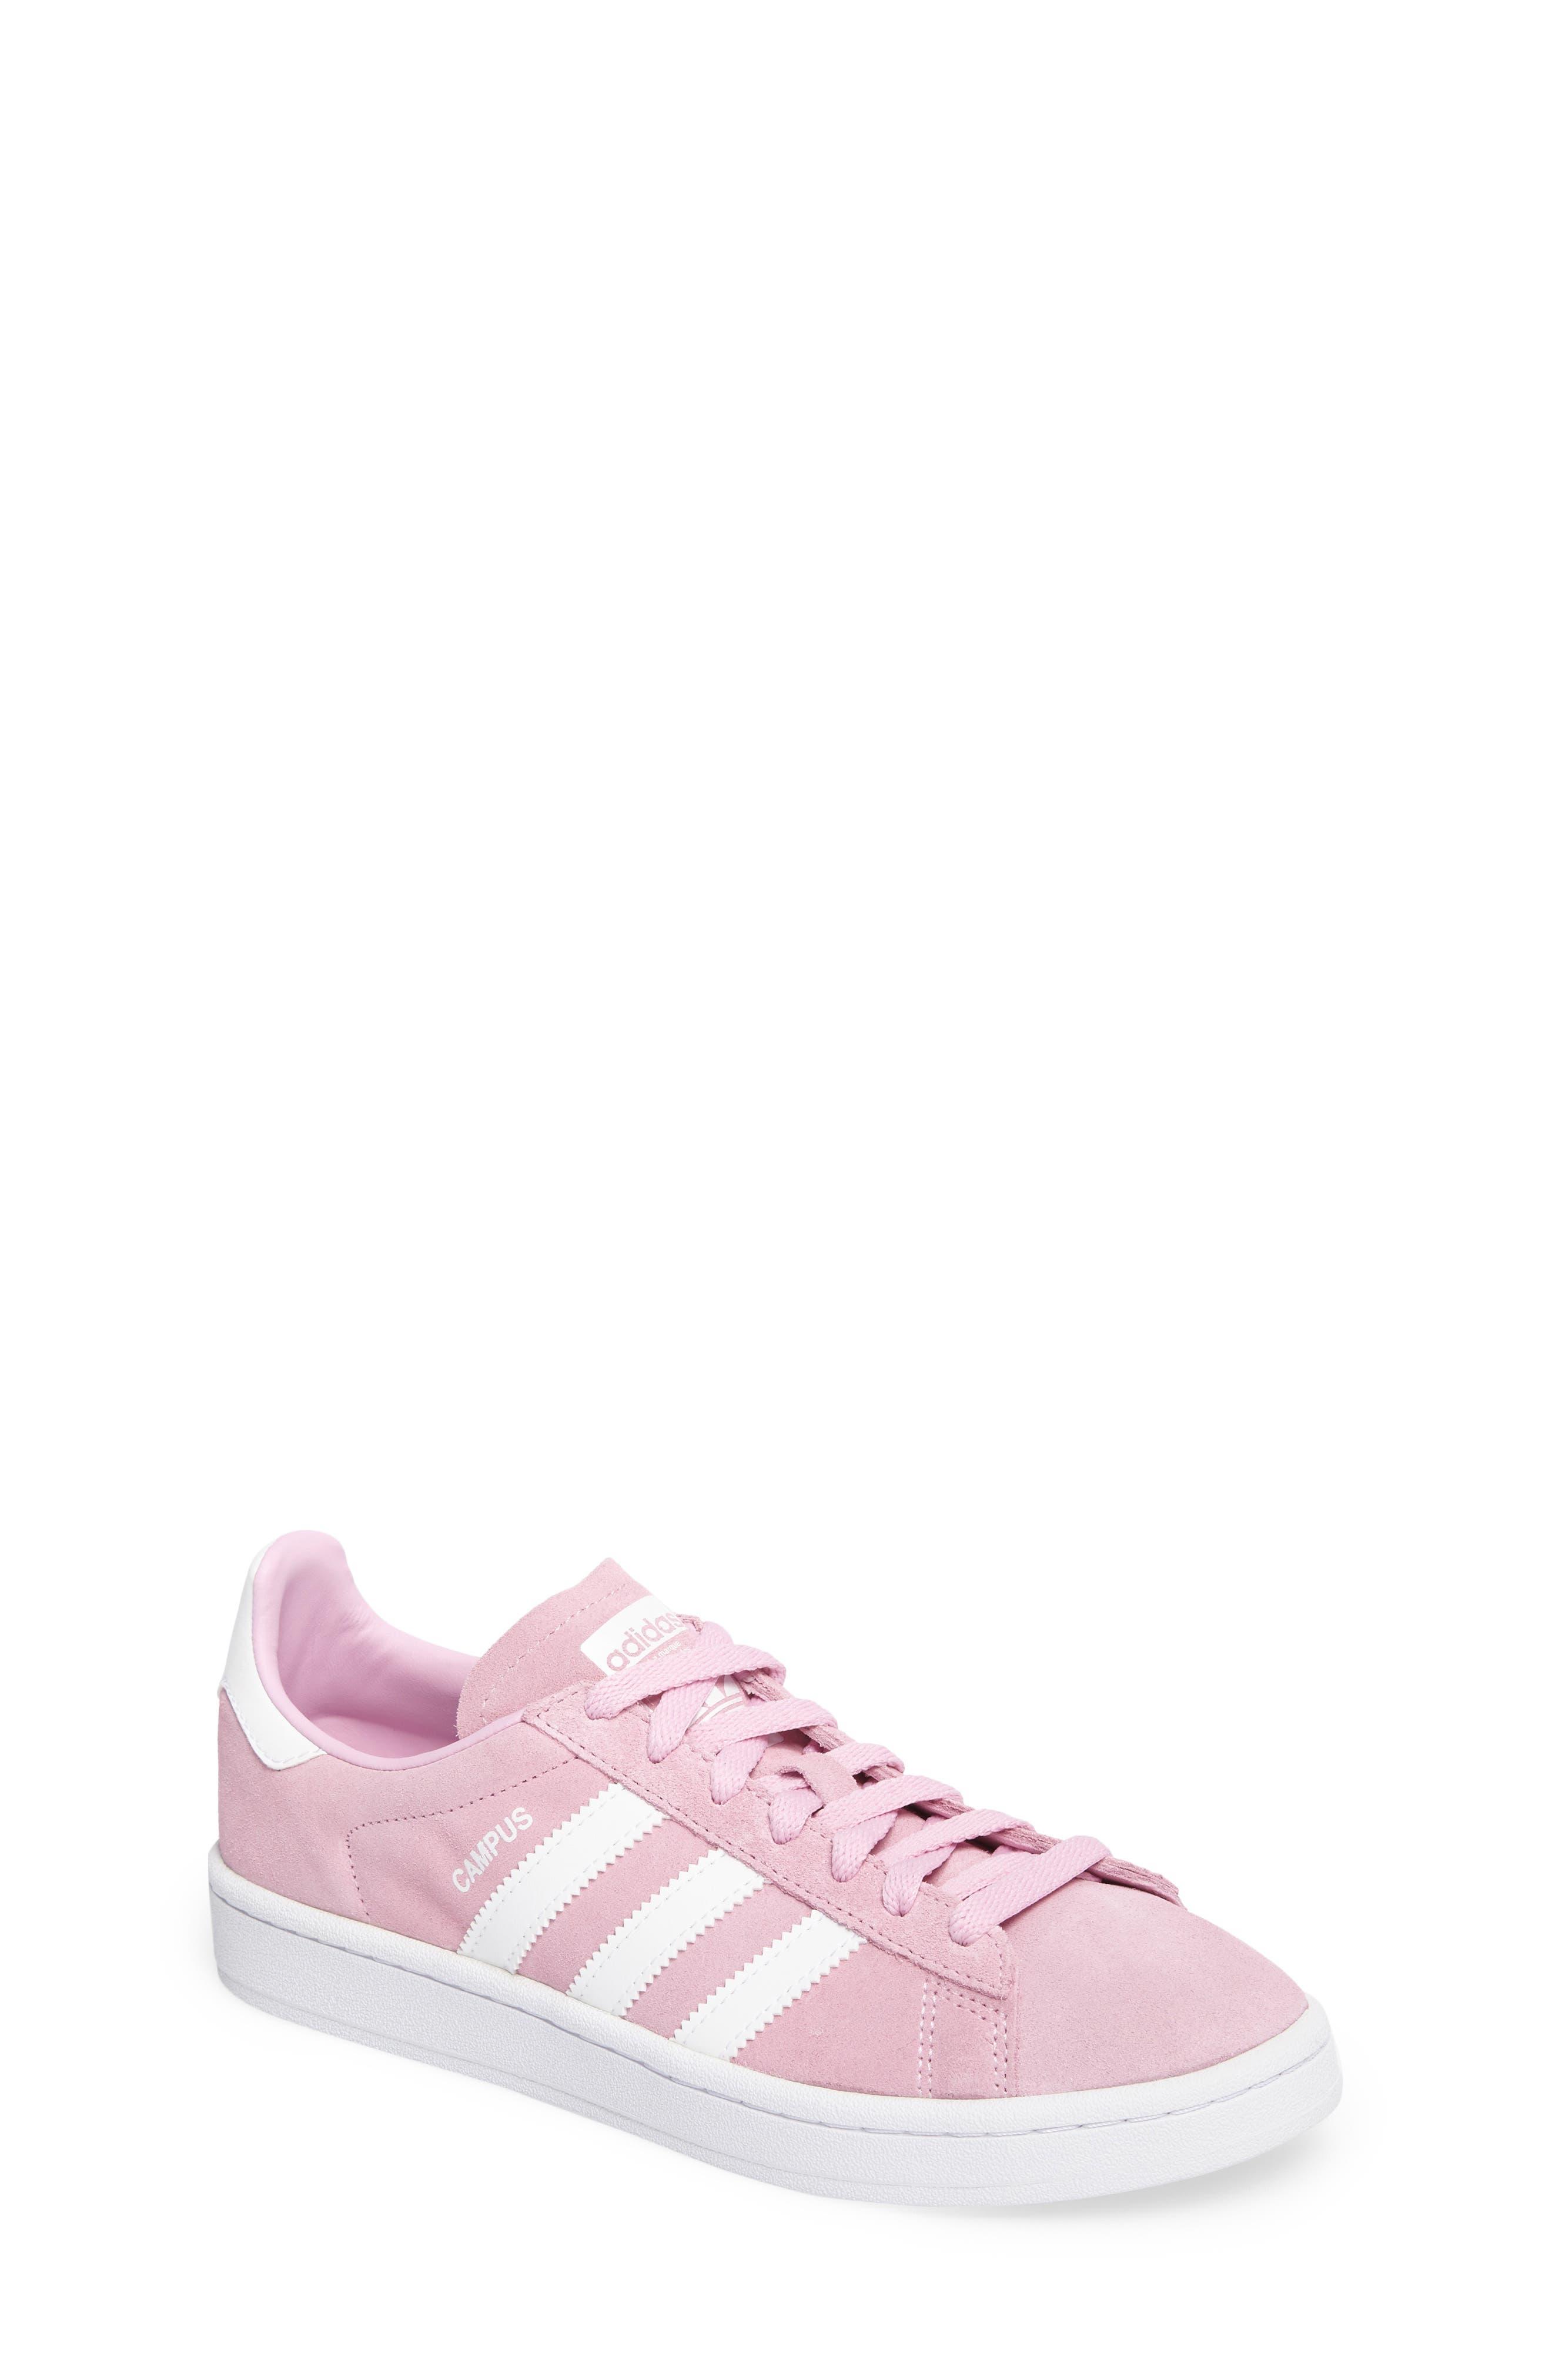 Alternate Image 1 Selected - adidas Campus Sneaker (Big Kid)